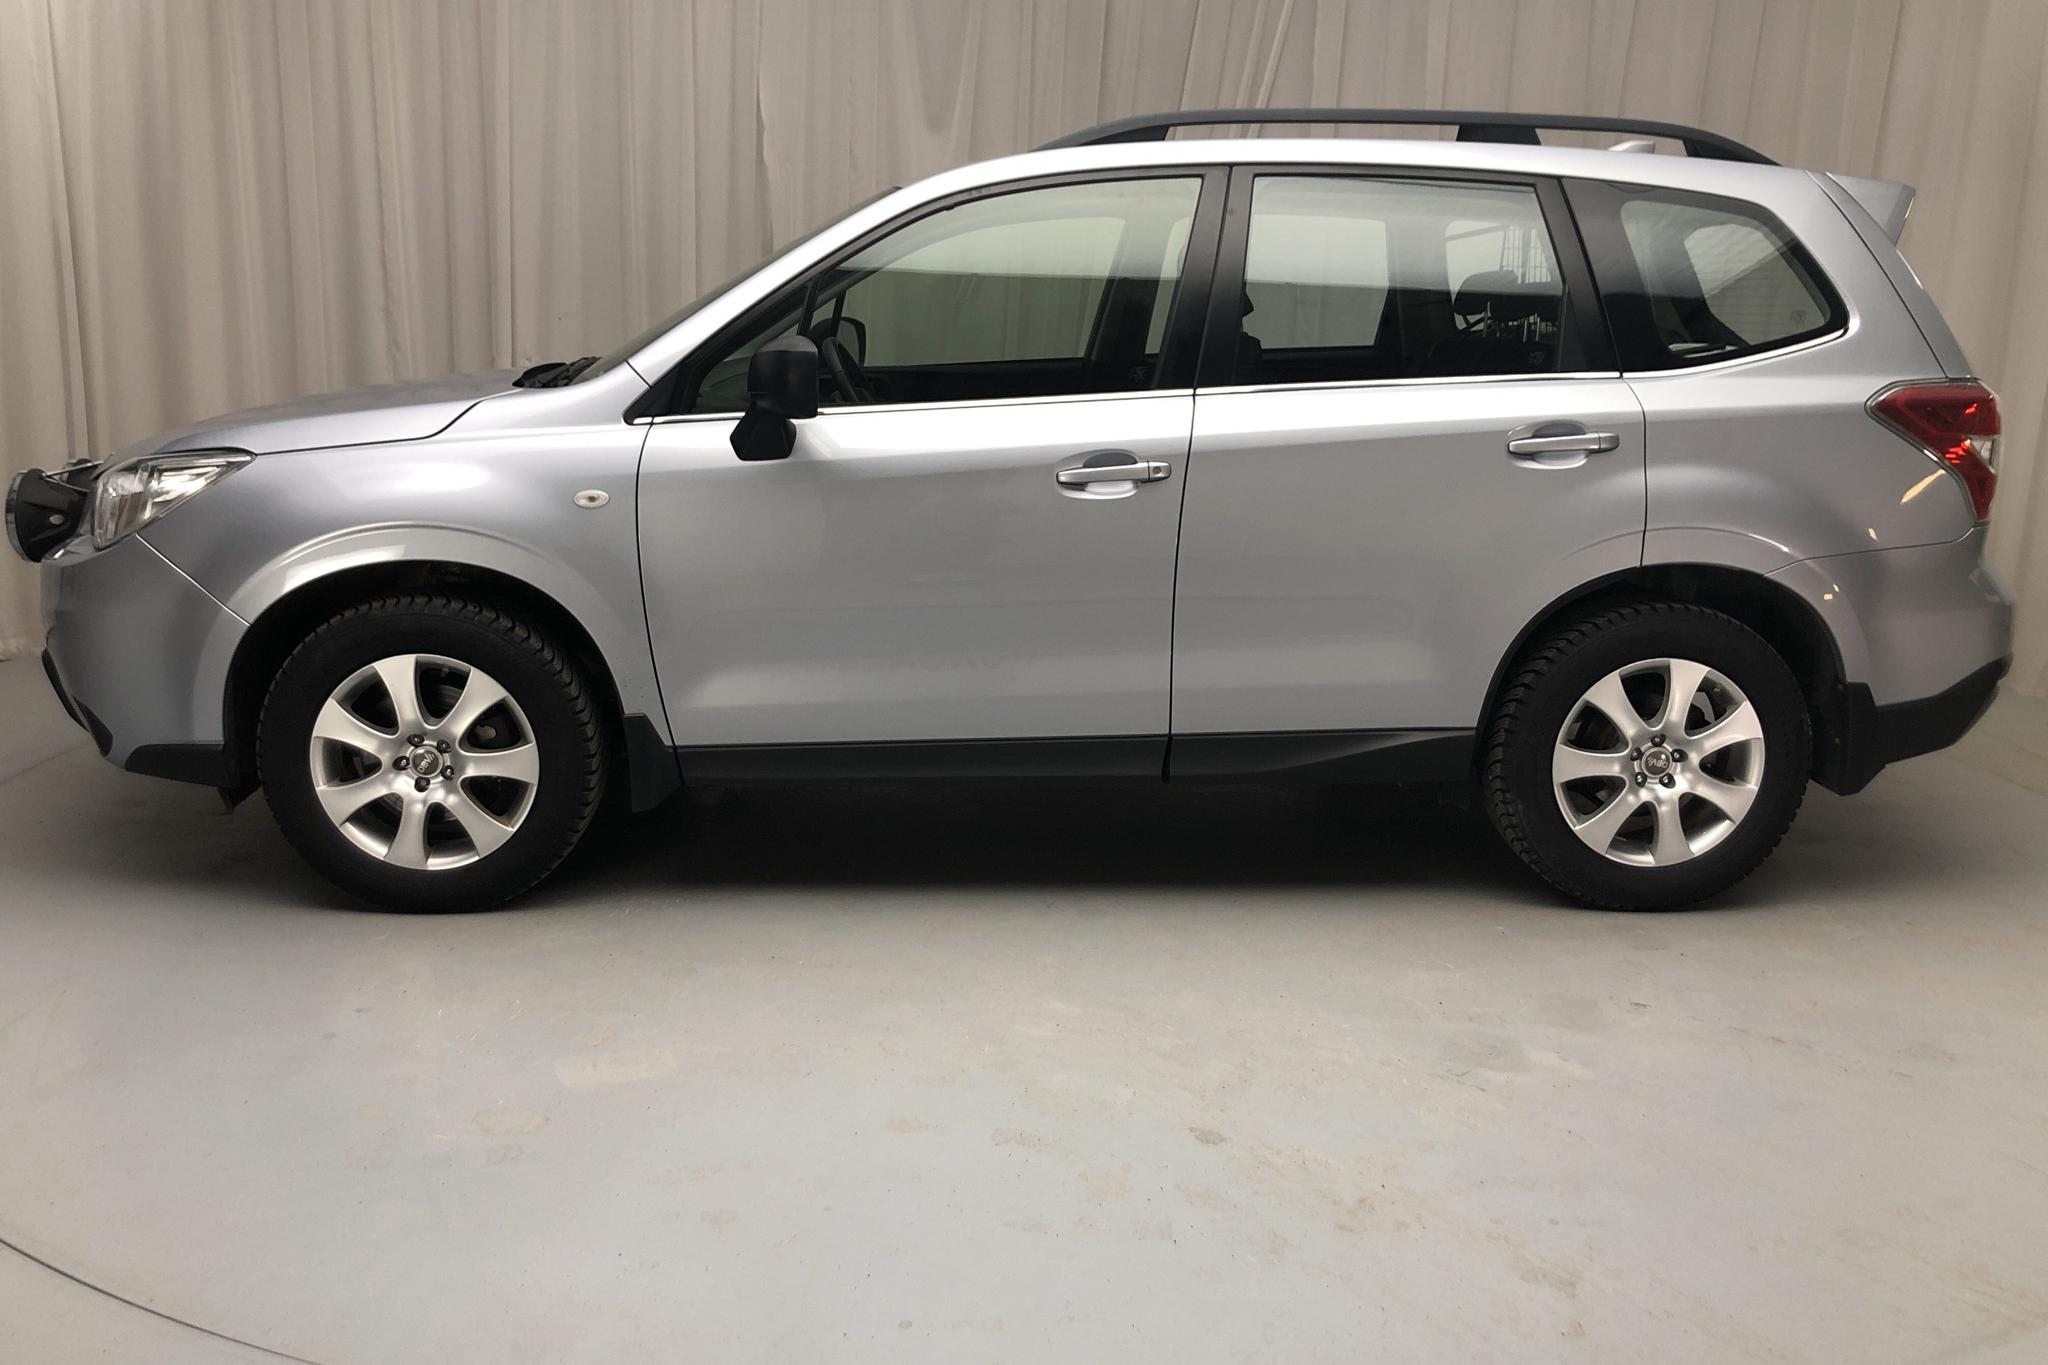 Subaru Forester 2.0D (147hk) - 8 080 mil - Automat - silver - 2015